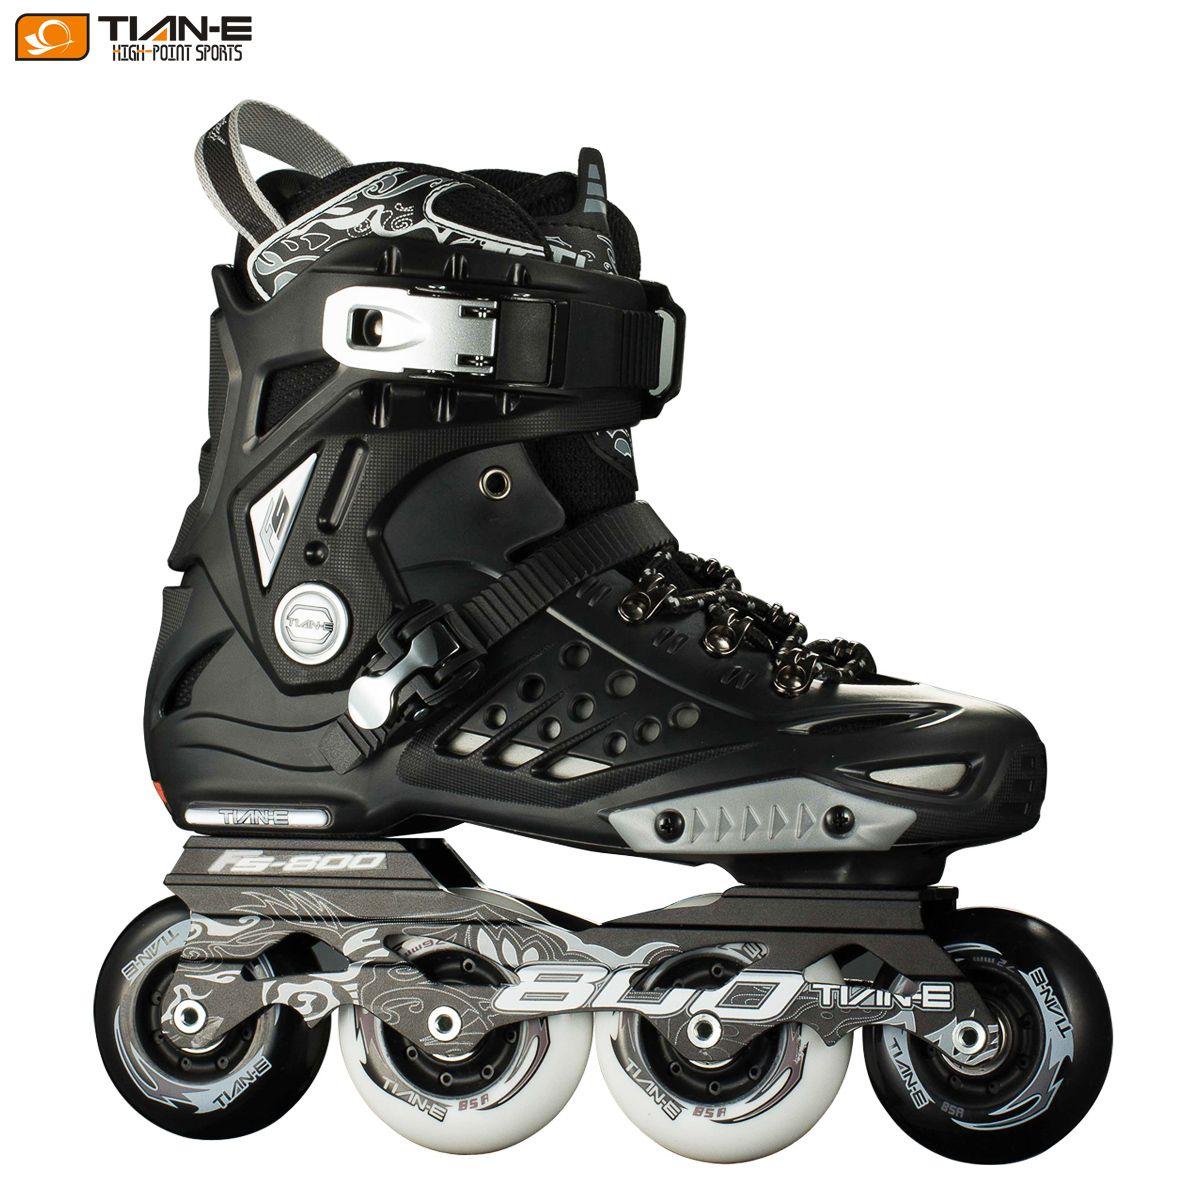 Roller skating shoes buy online - Online Cheap Wholesale Adult Roller Skates Skating Shoes Professional Slalom Skates By Simmer Dhgate Com